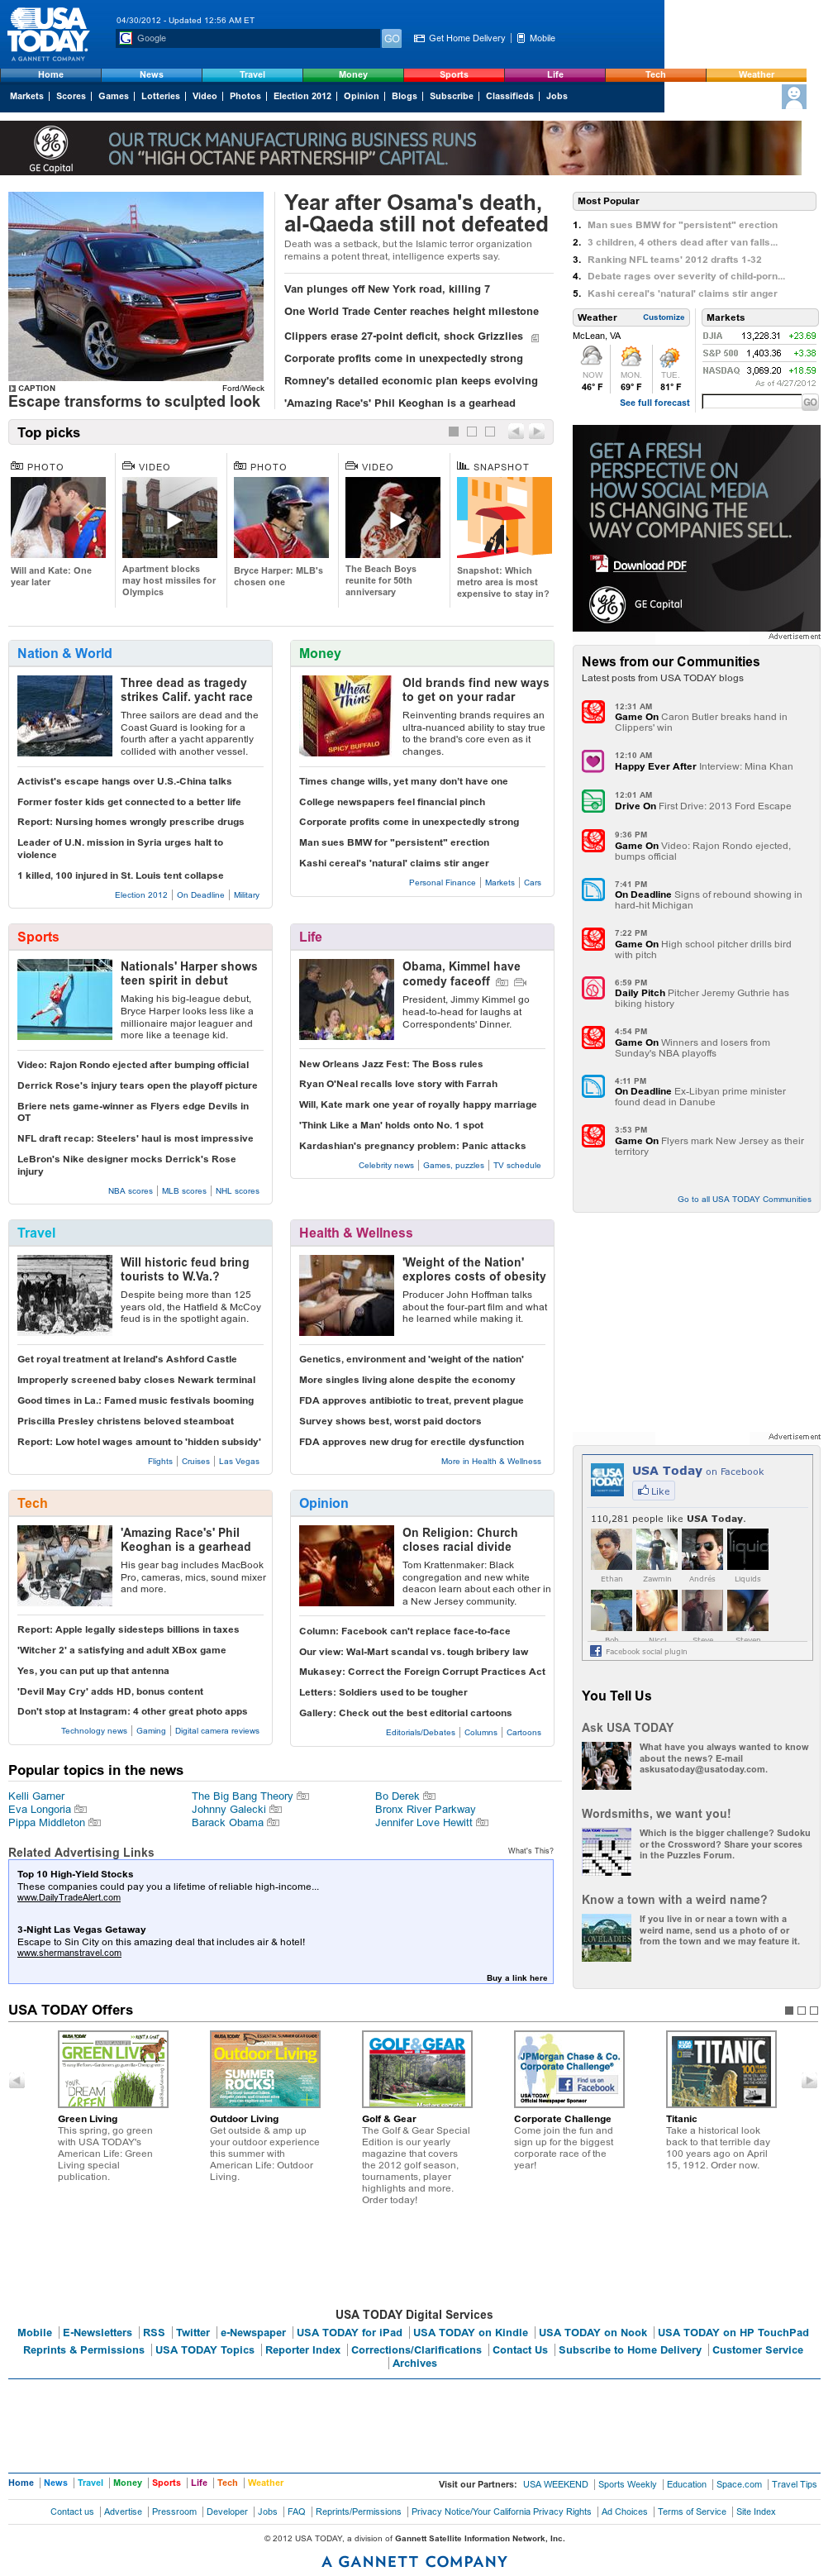 USA Today at Monday April 30, 2012, 5:12 a.m. UTC